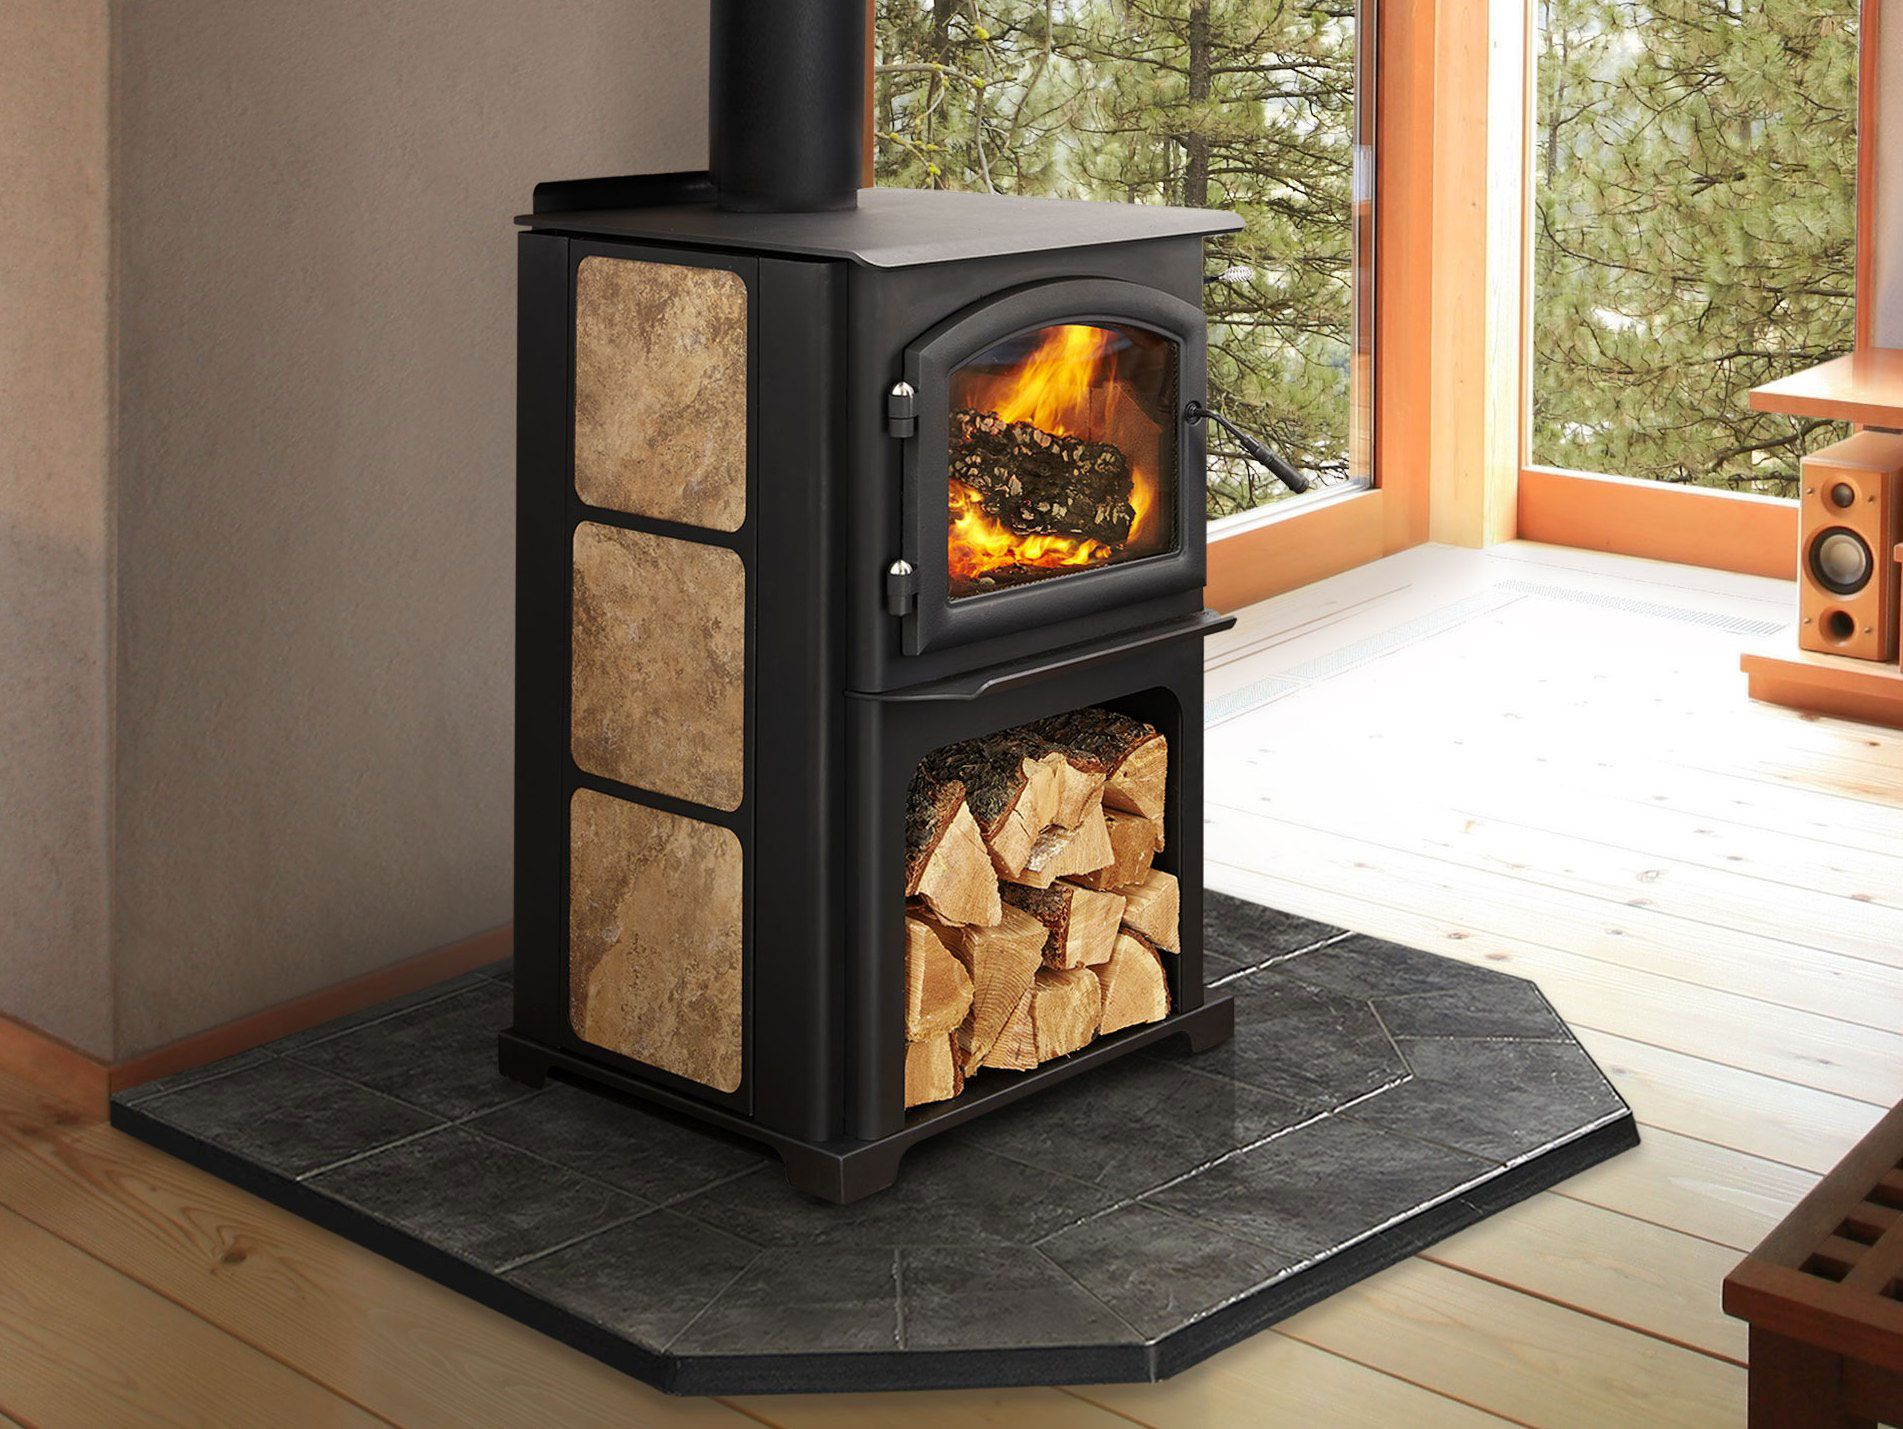 3100 Limited Edition Ashx 1903 1429 Wood Stove Quadra Fire Wood Stove Wood Heat